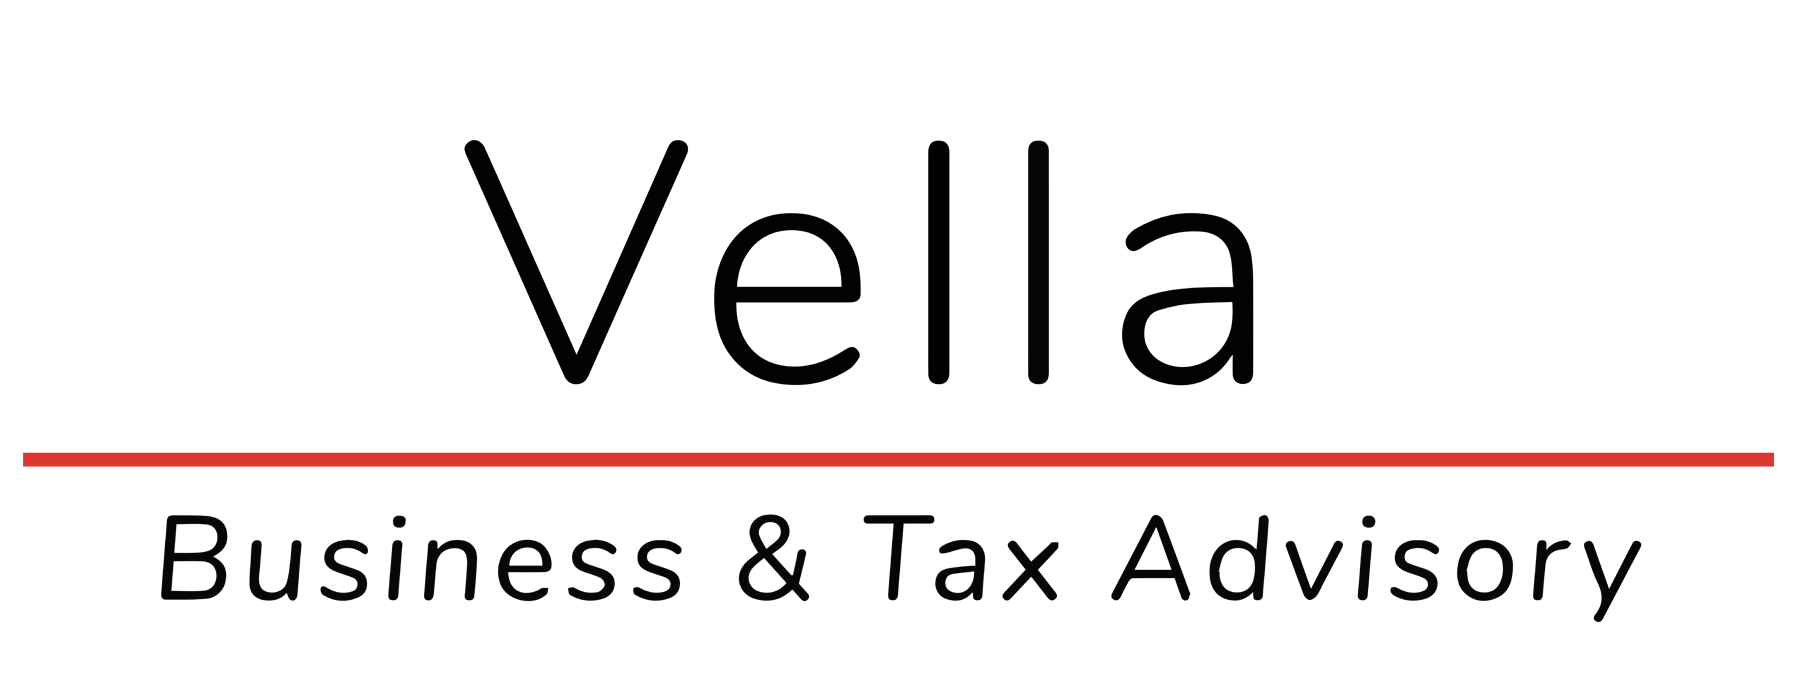 Vella advisory